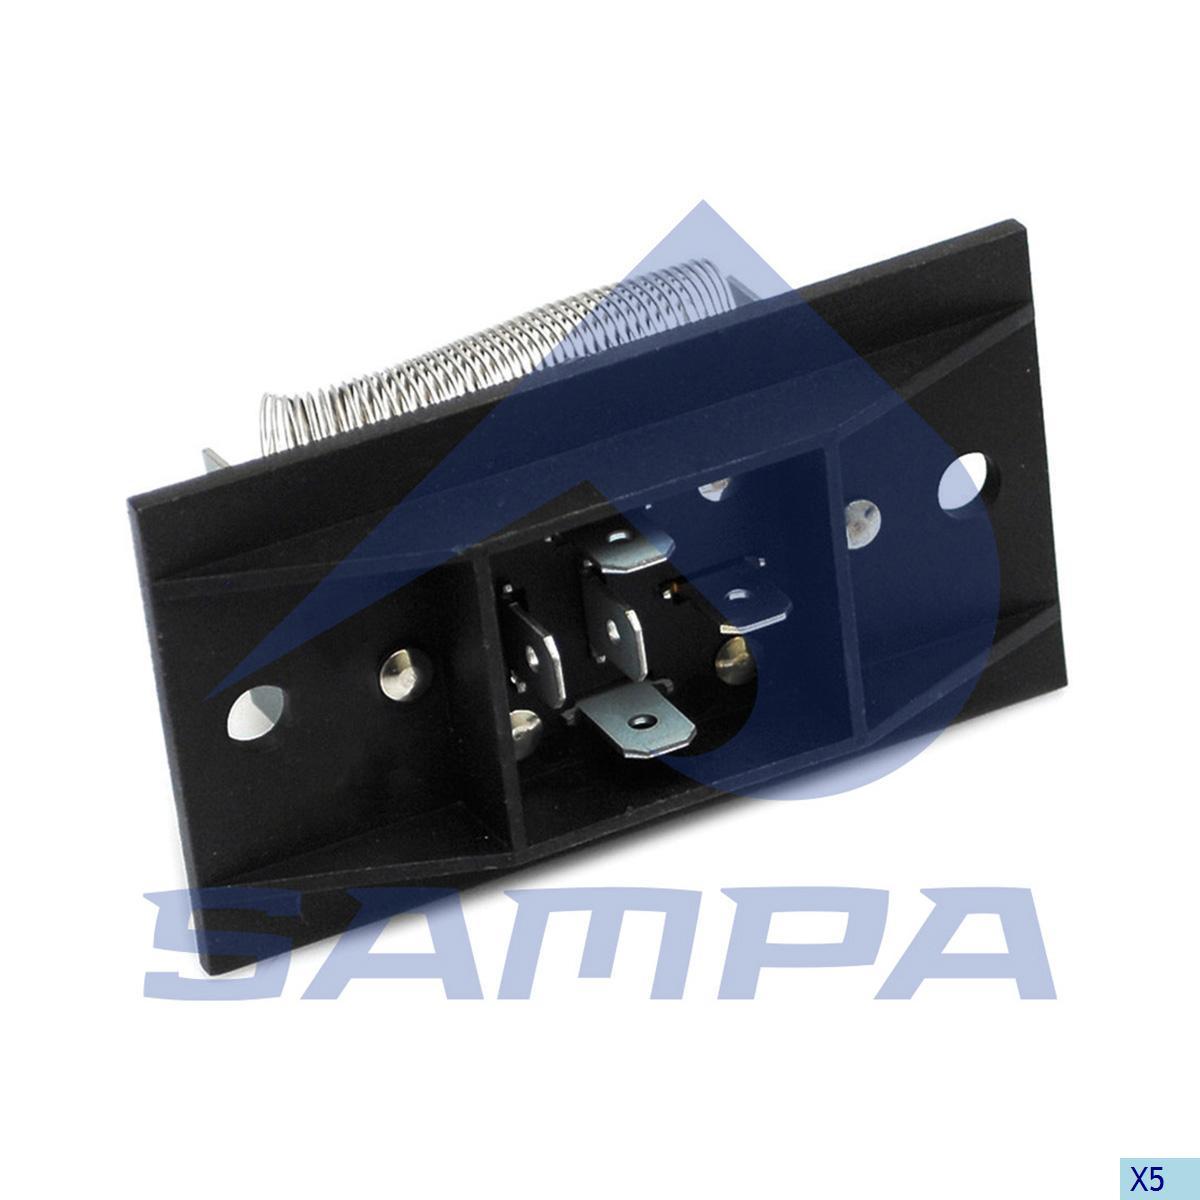 Heater Unit, Cab Heating & Ventilation, Scania, Cab